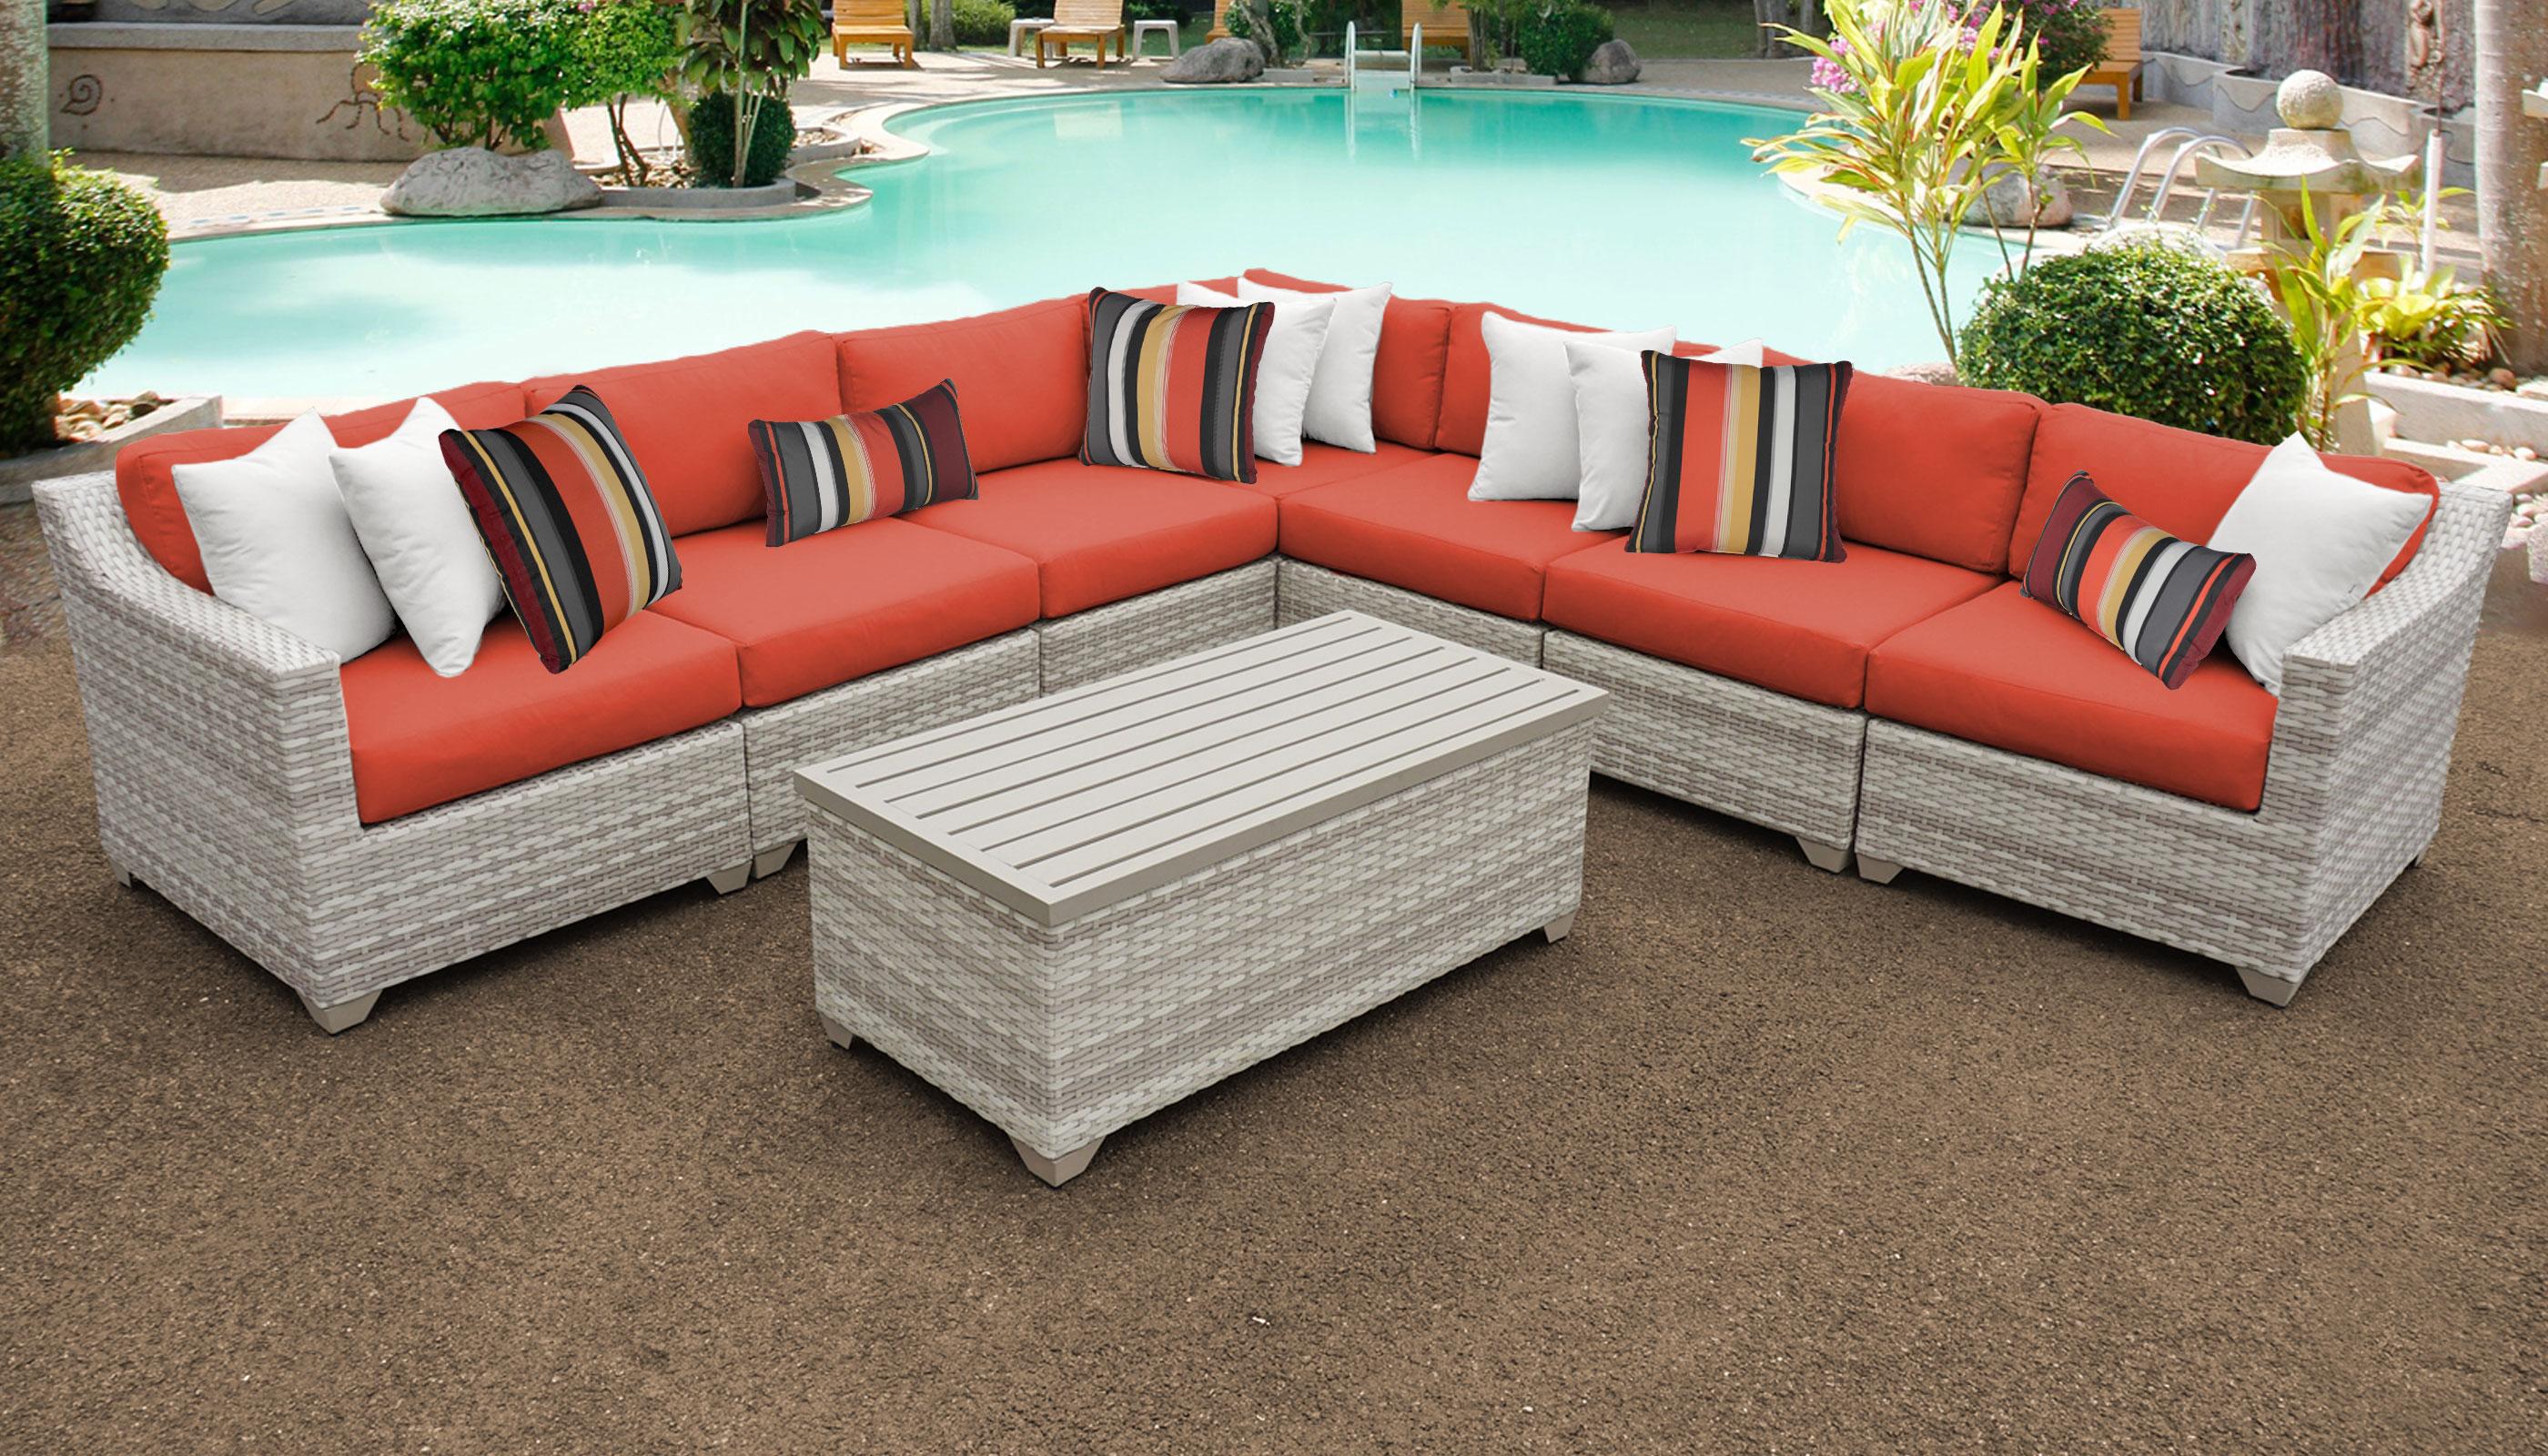 Fairmont 8 Piece Outdoor Wicker Patio Furniture Set 08a